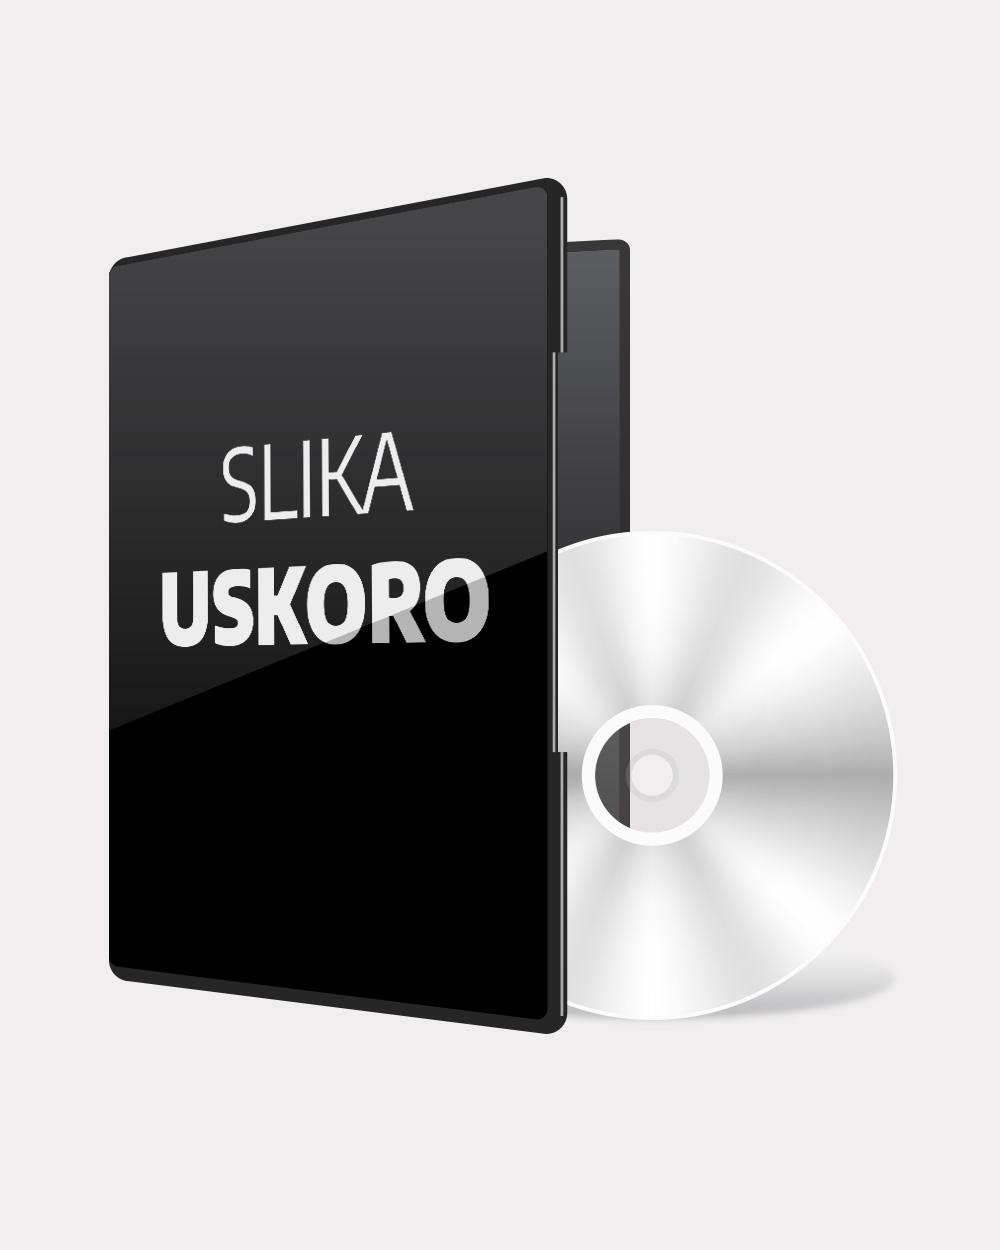 PS4 Injustice Utimate Edition